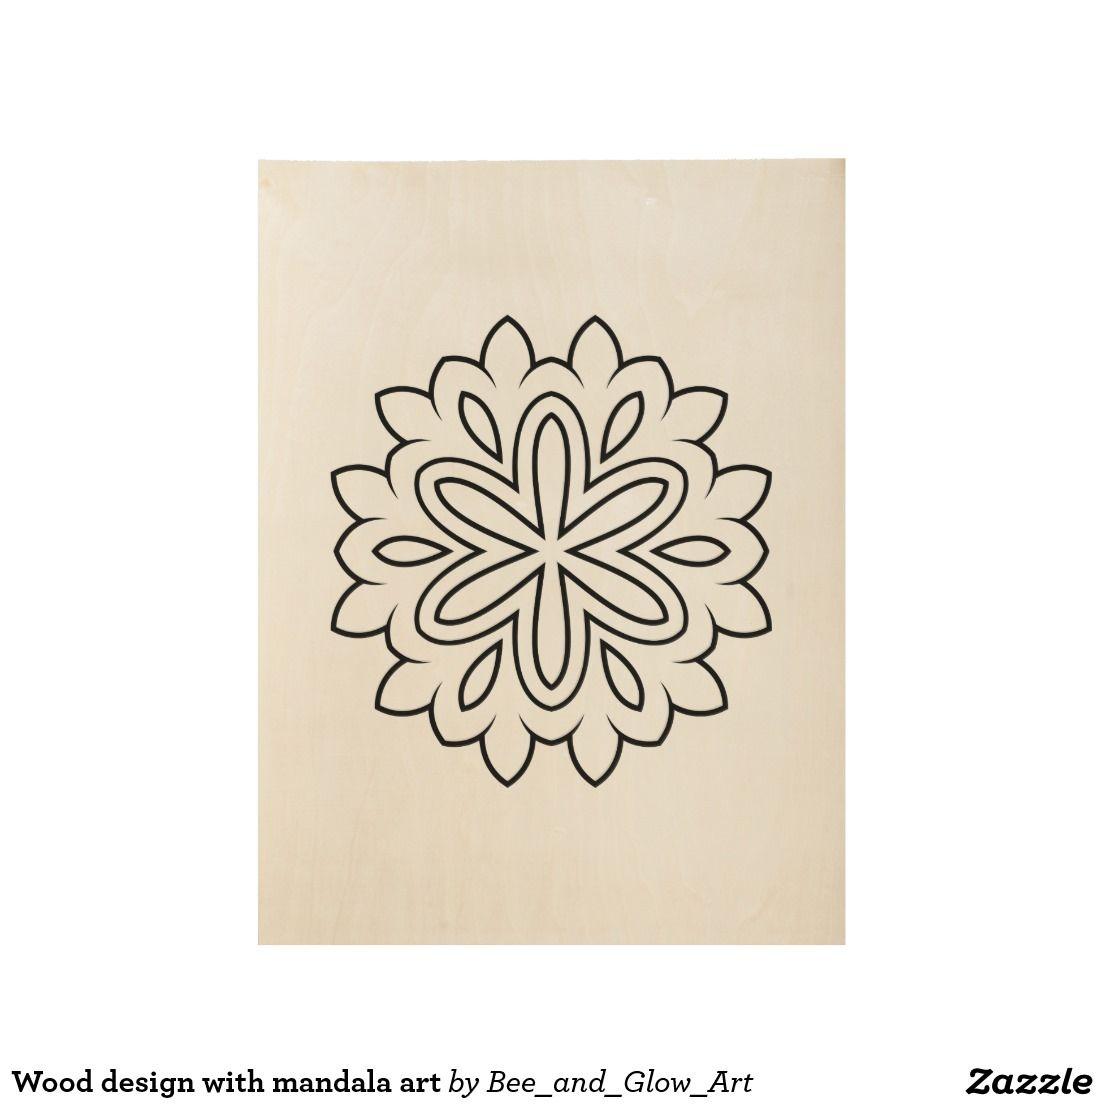 Wood design with mandala art